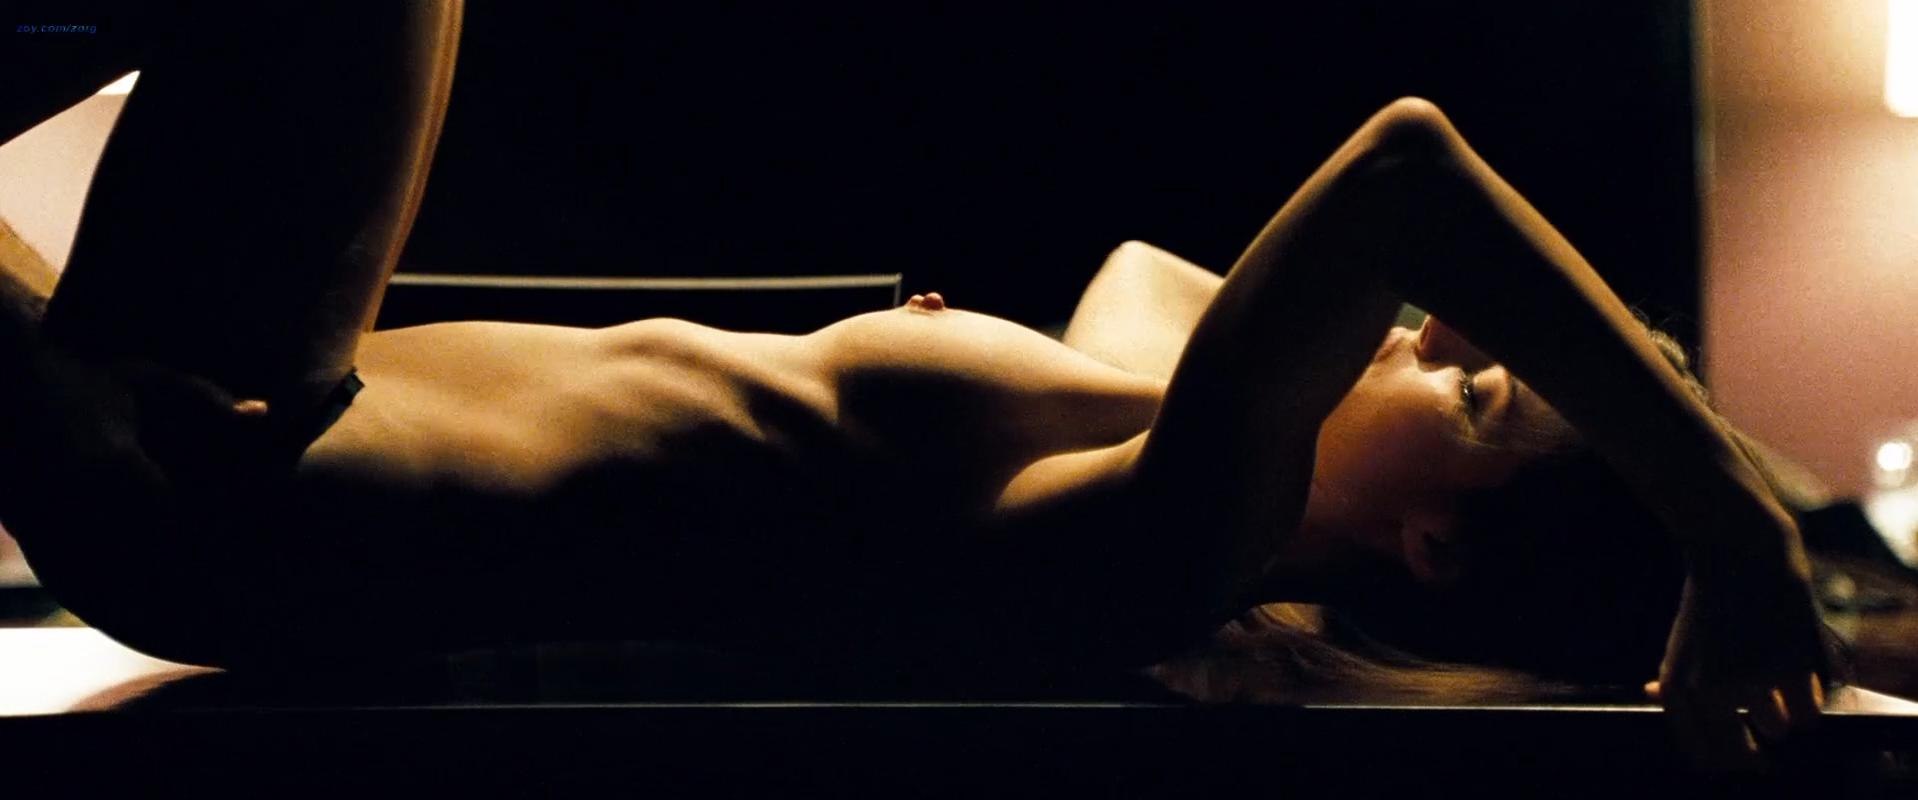 Natasha Henstridge nude, Charlotte Rampling nude, Maggie Q sexy, Paz de la Huerta nude, Michelle Williams nude - Deception (2008)